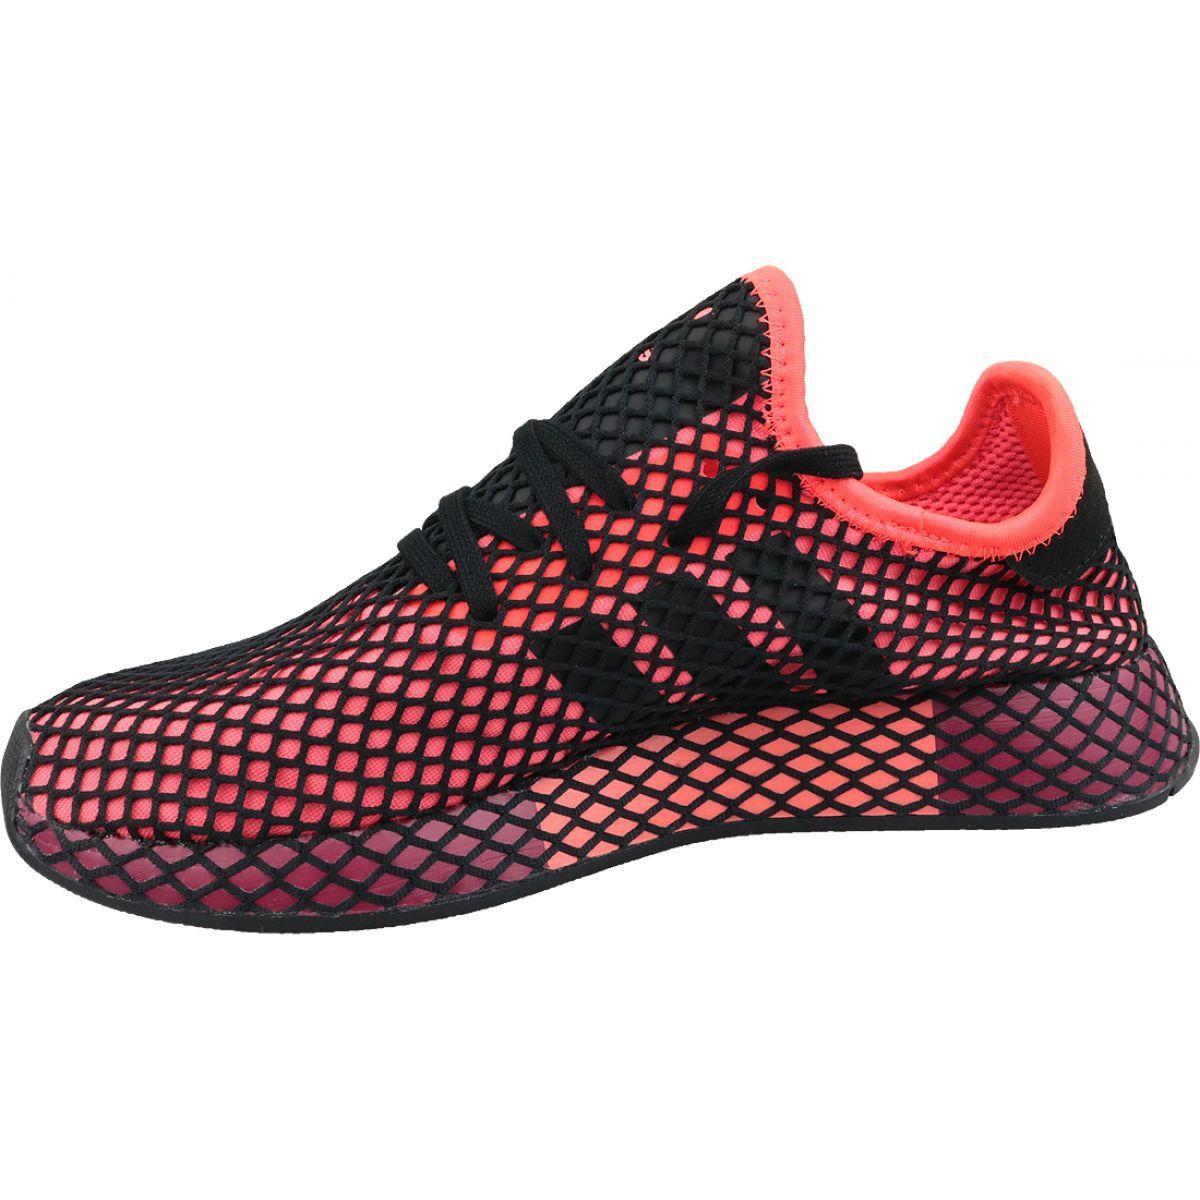 Buty Adidas Deerupt Runner M Ee5661 Czerwone Adidas Brand Sports Shoes Adidas Adidas